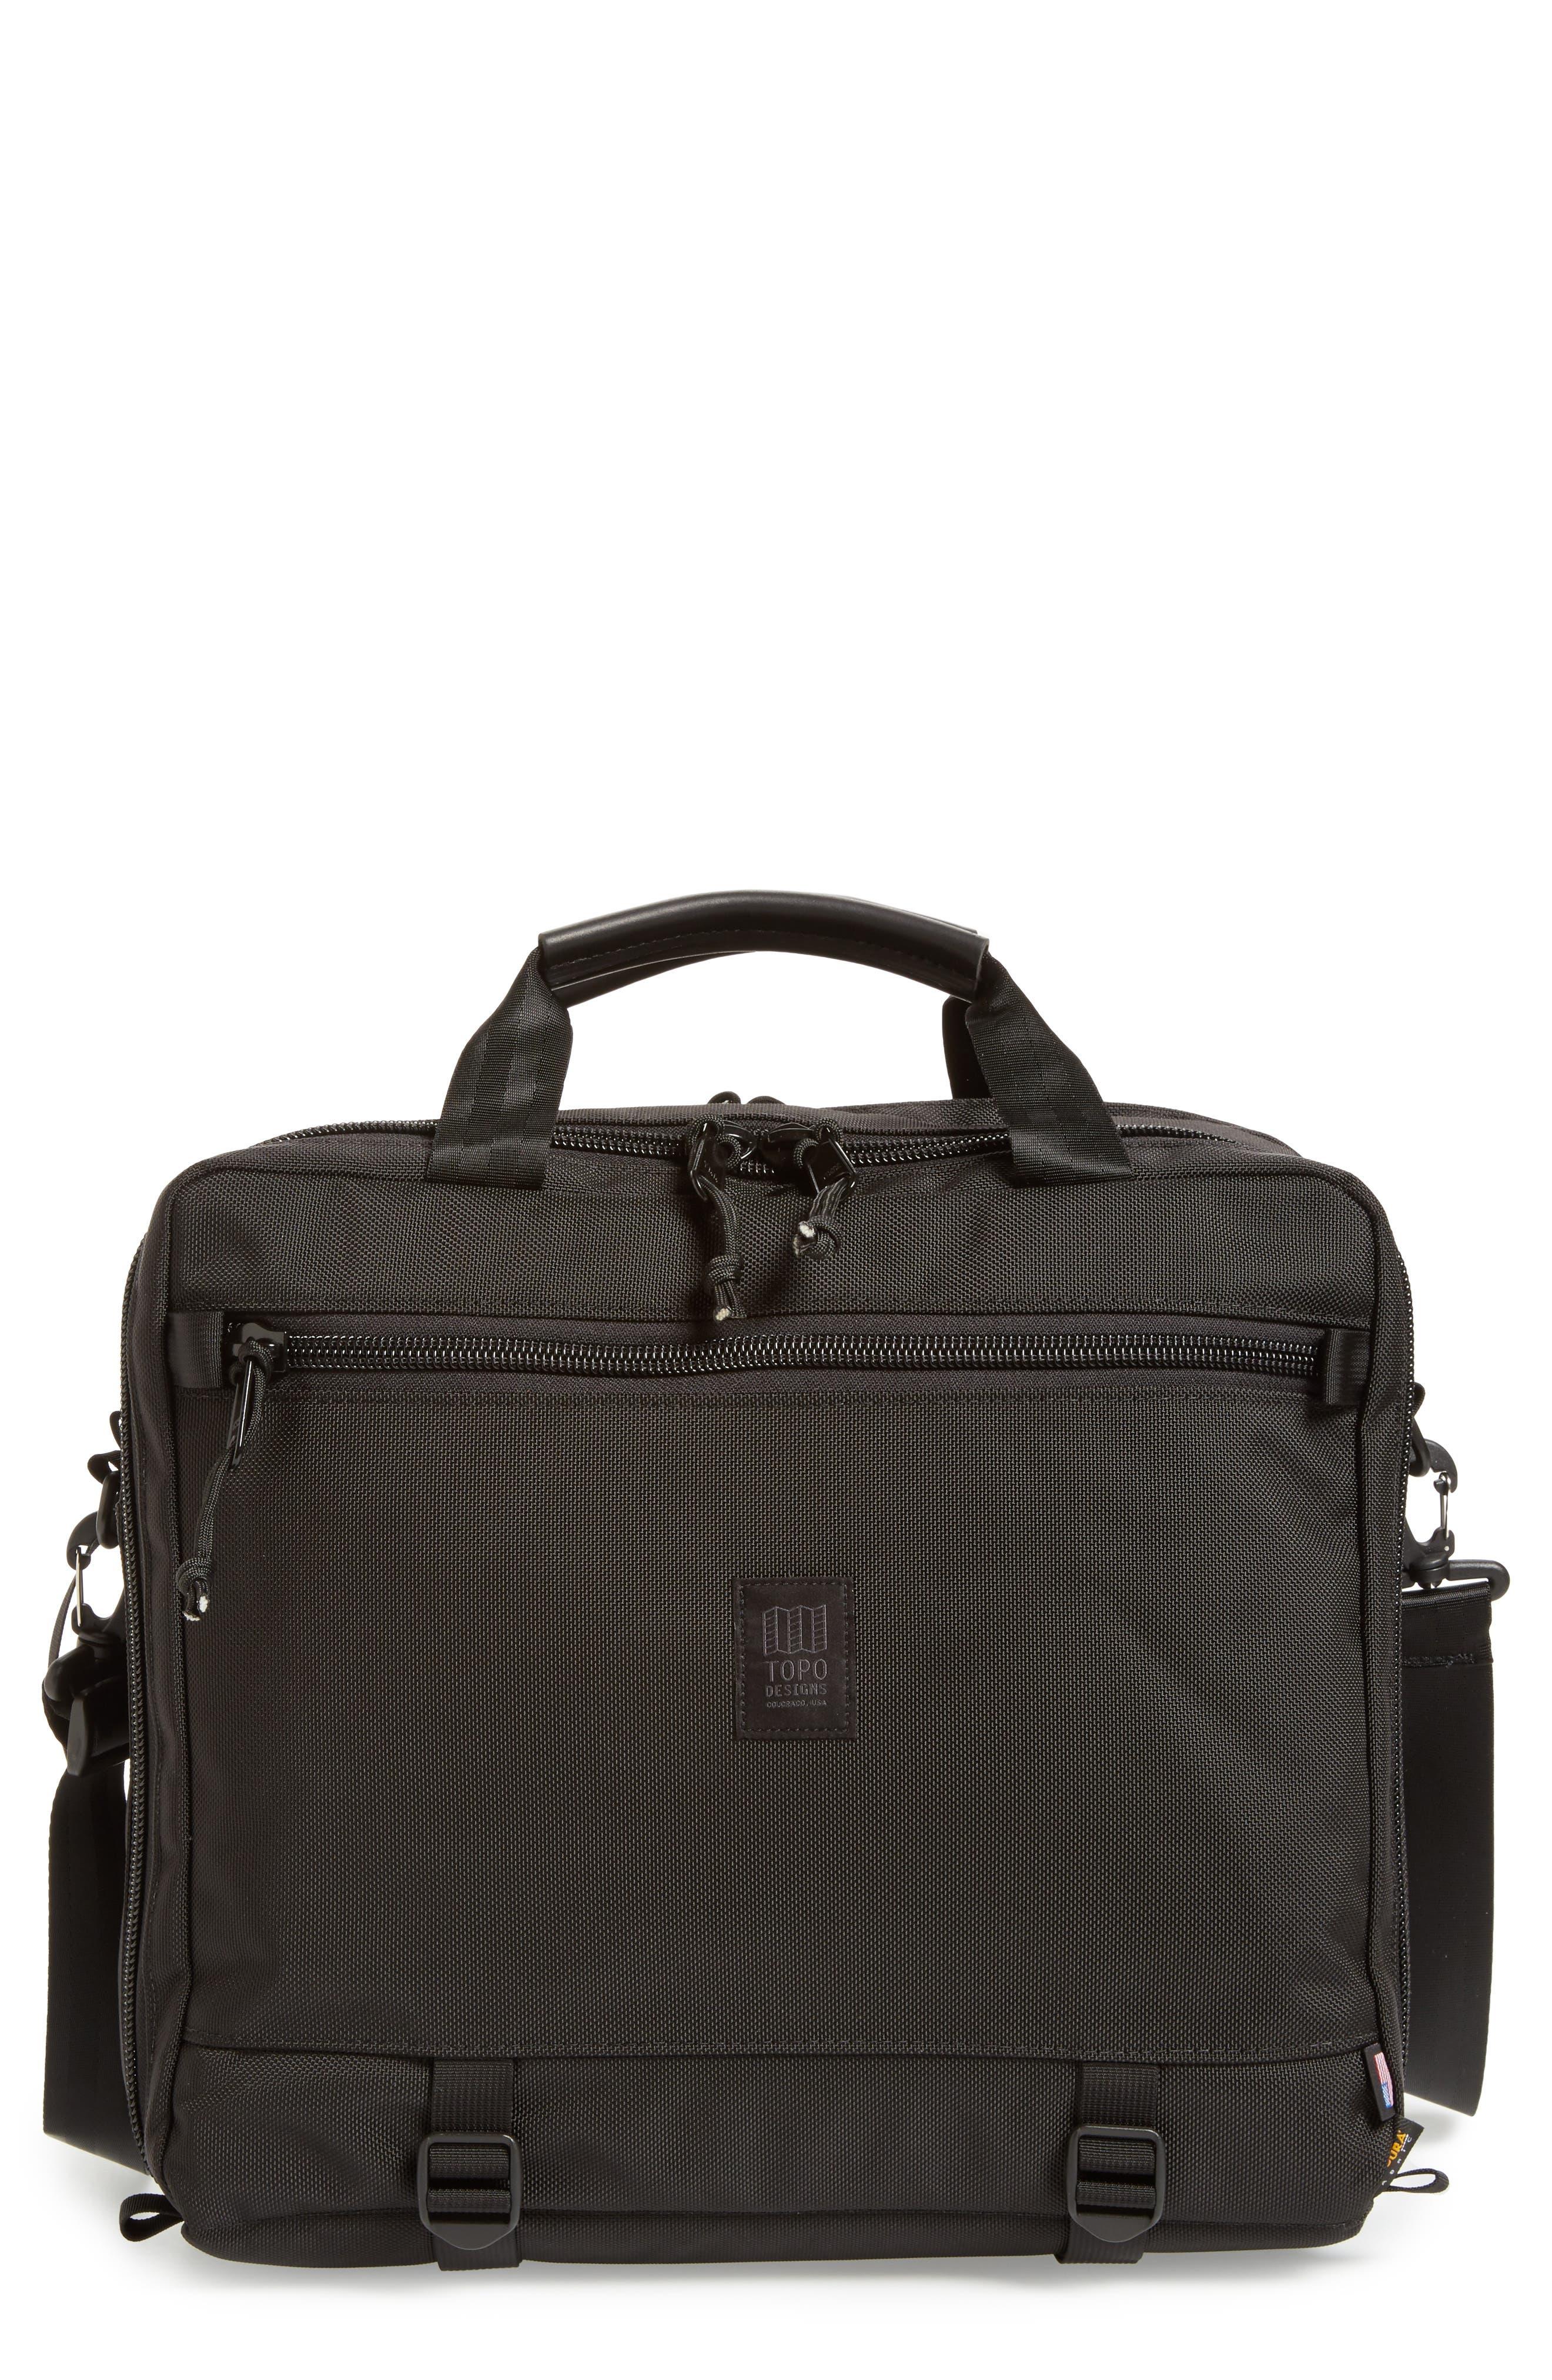 Main Image - Topo Designs 3-Day Briefcase